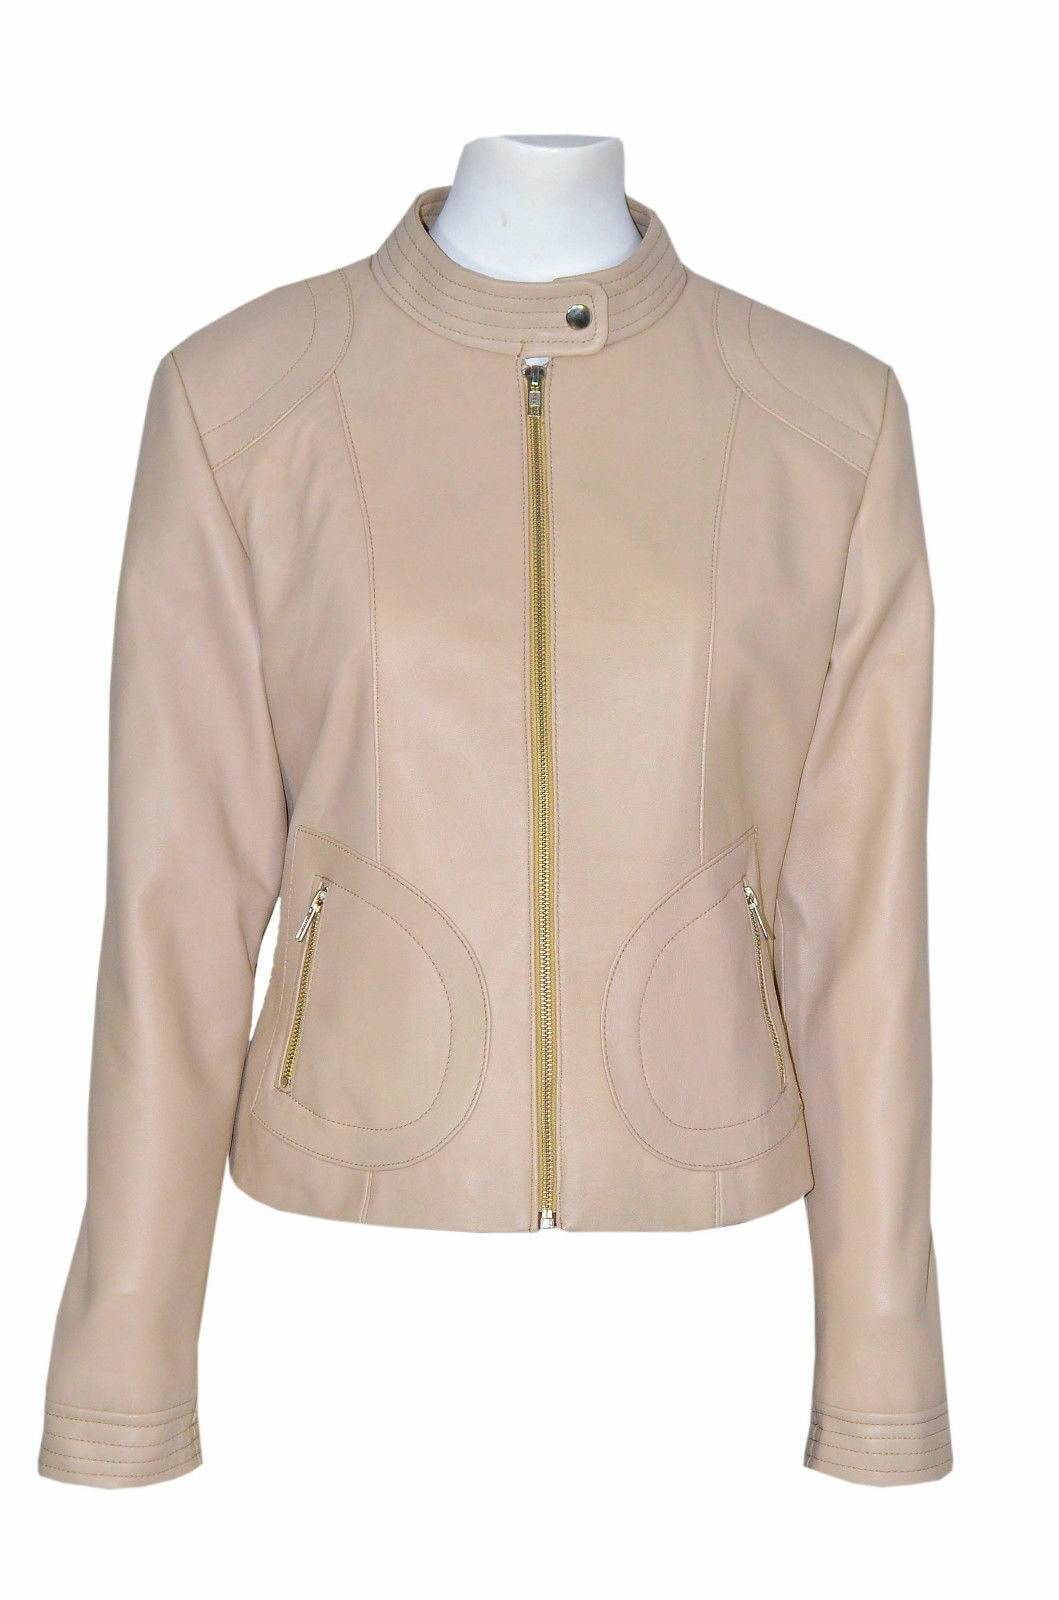 Ladies 7626 Summer Beige Cool Retro Biker Style Fitted Designer Italian Leather